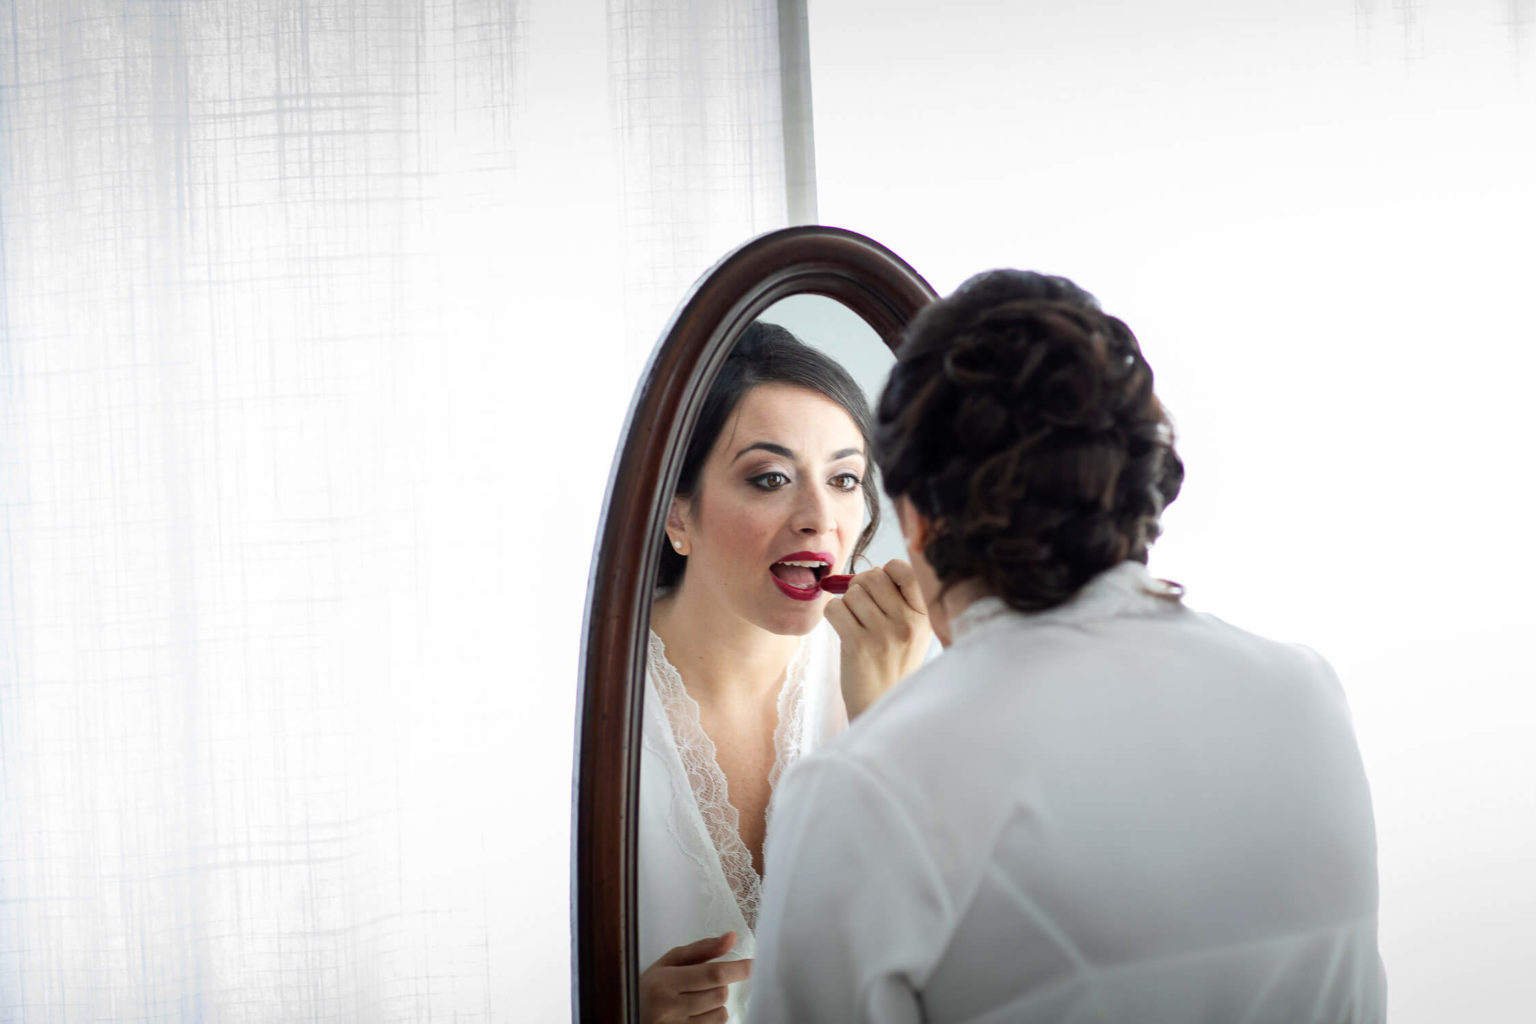 Bride puts on lipstick, photograph by Nino Lombardo